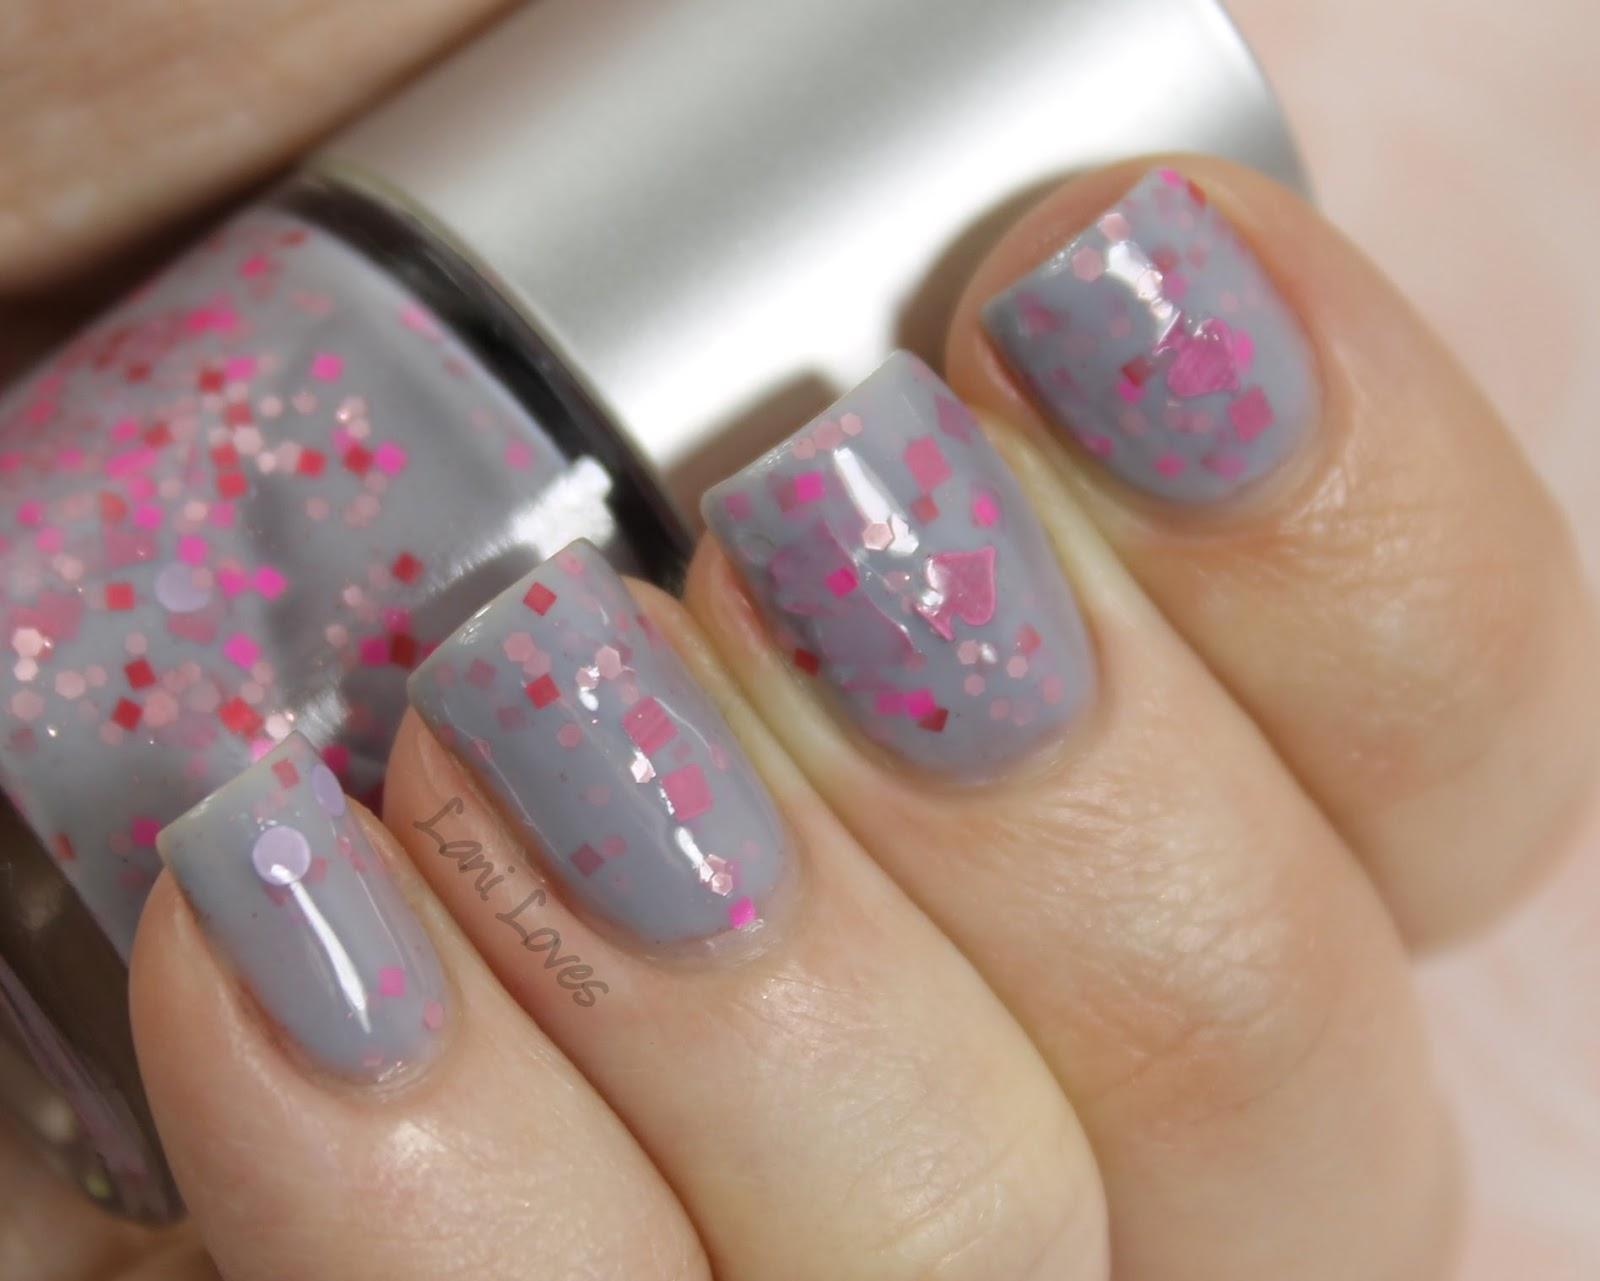 Star Kin Pink of Spades nail polish swatch